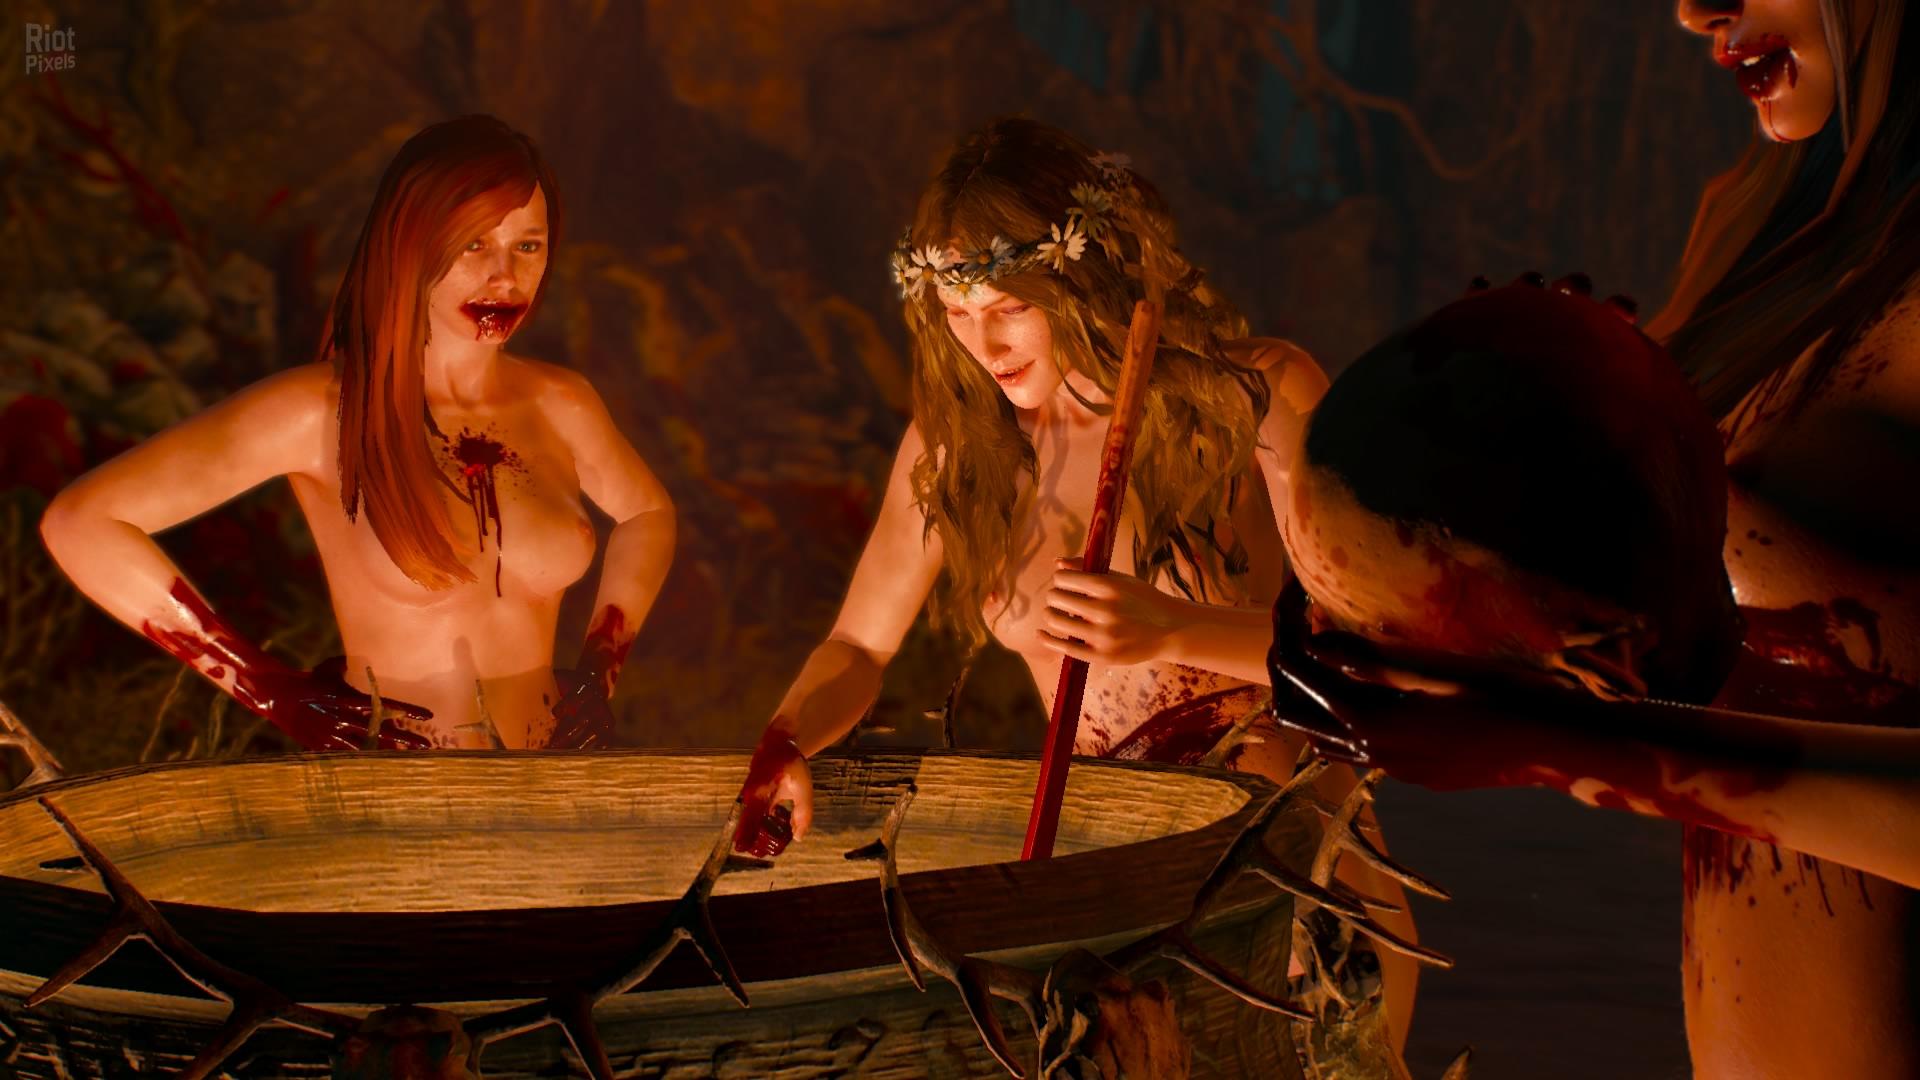 Nude girl on torture xxx photos